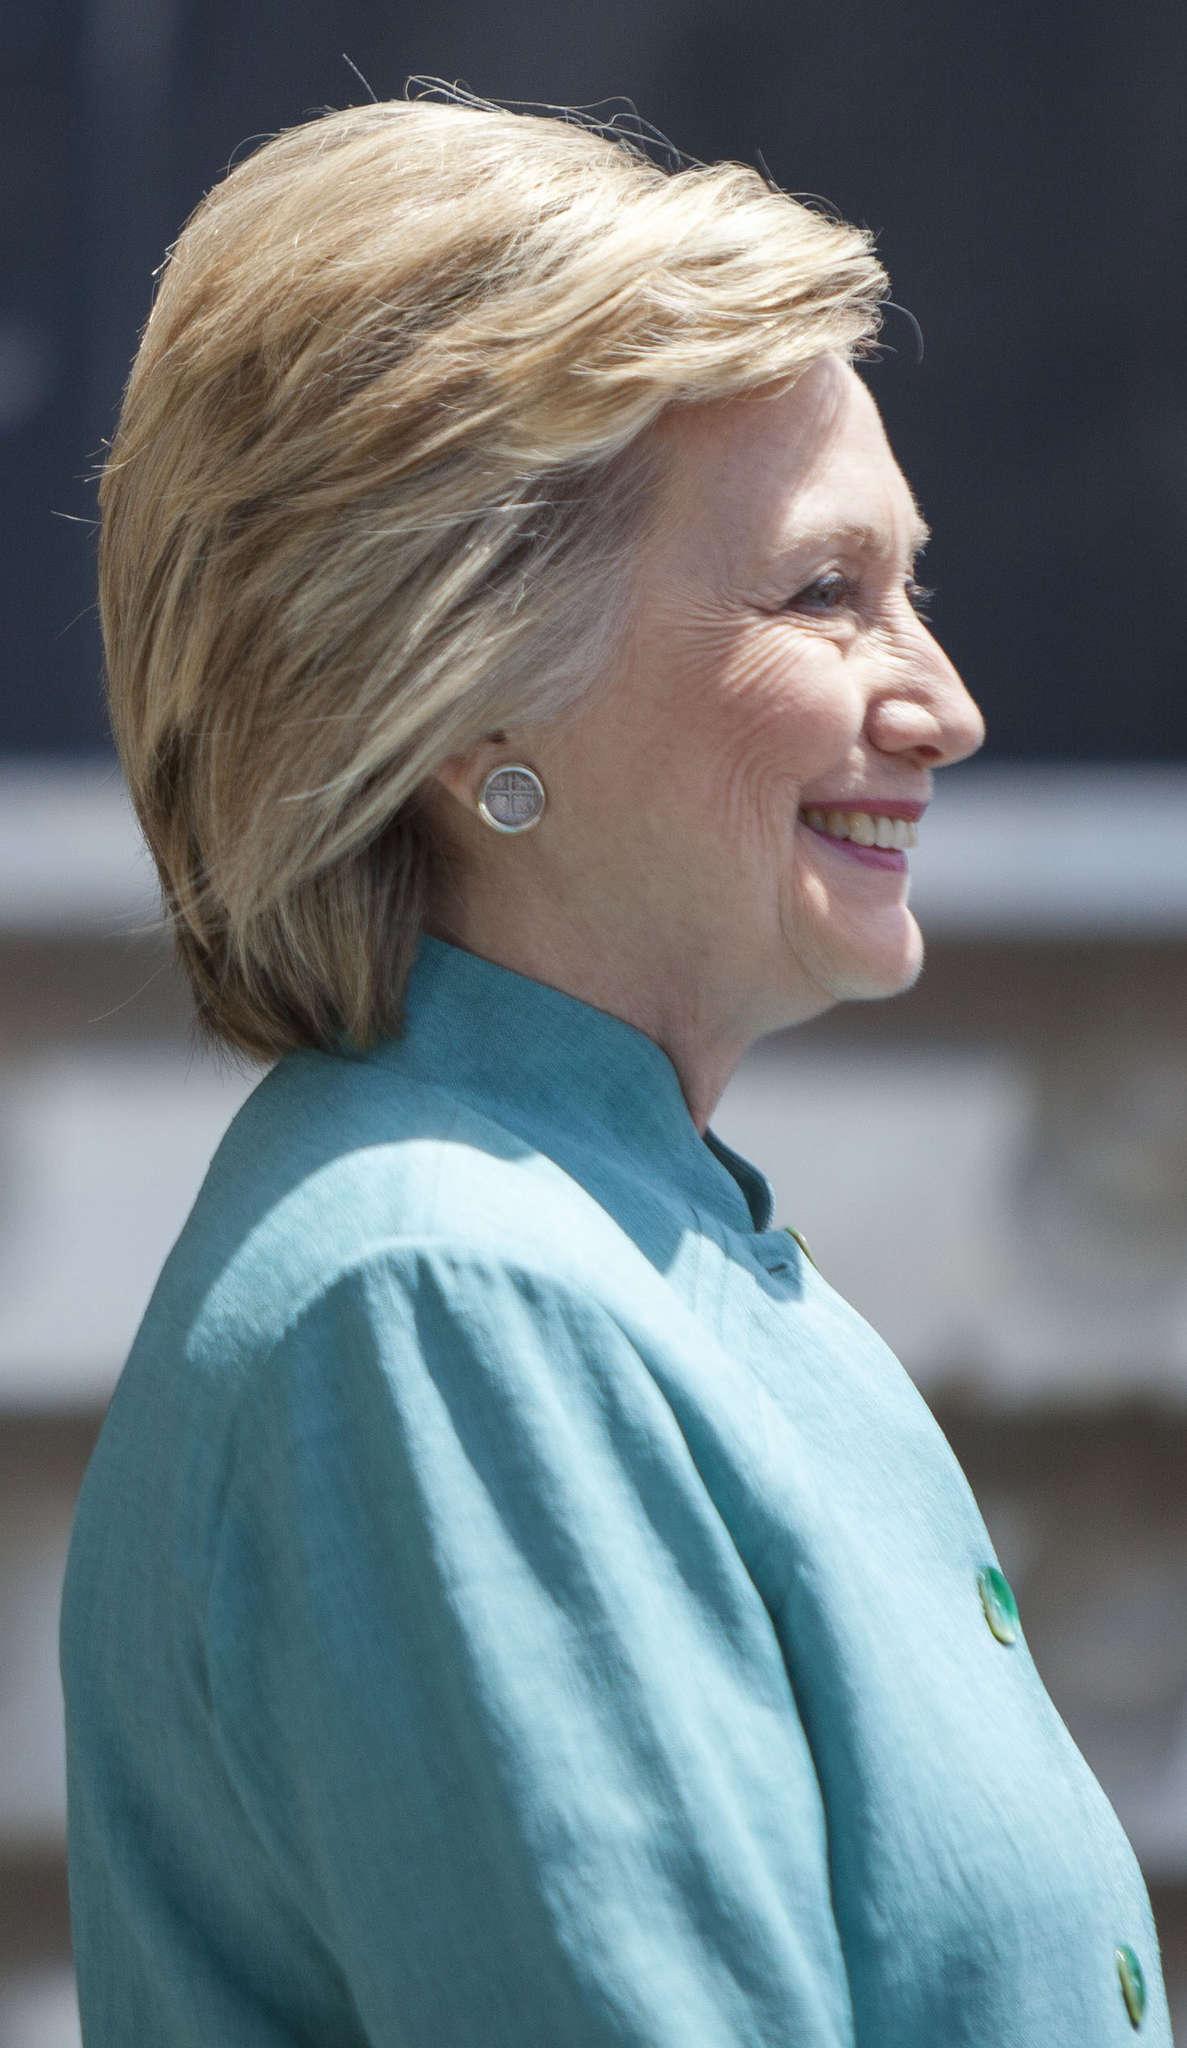 Clinton's positions